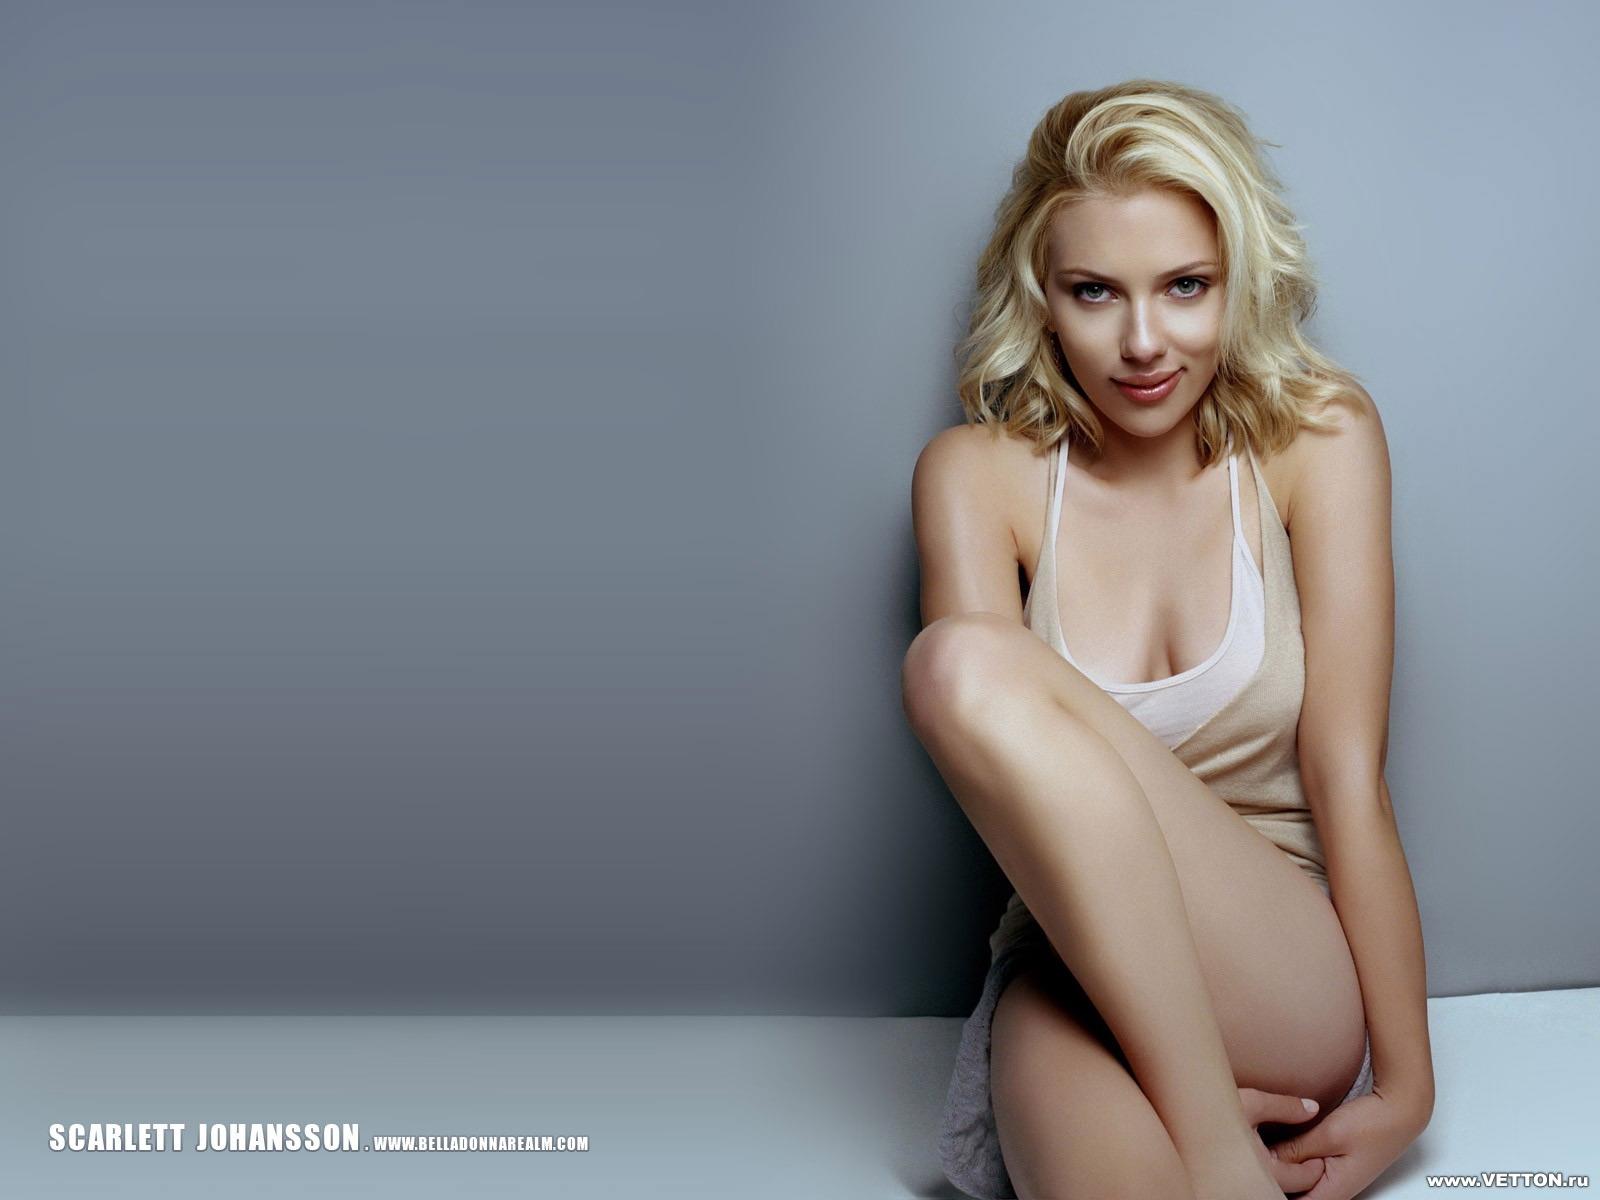 Scarlett Johansson Profile Nd Wallpaper 2012